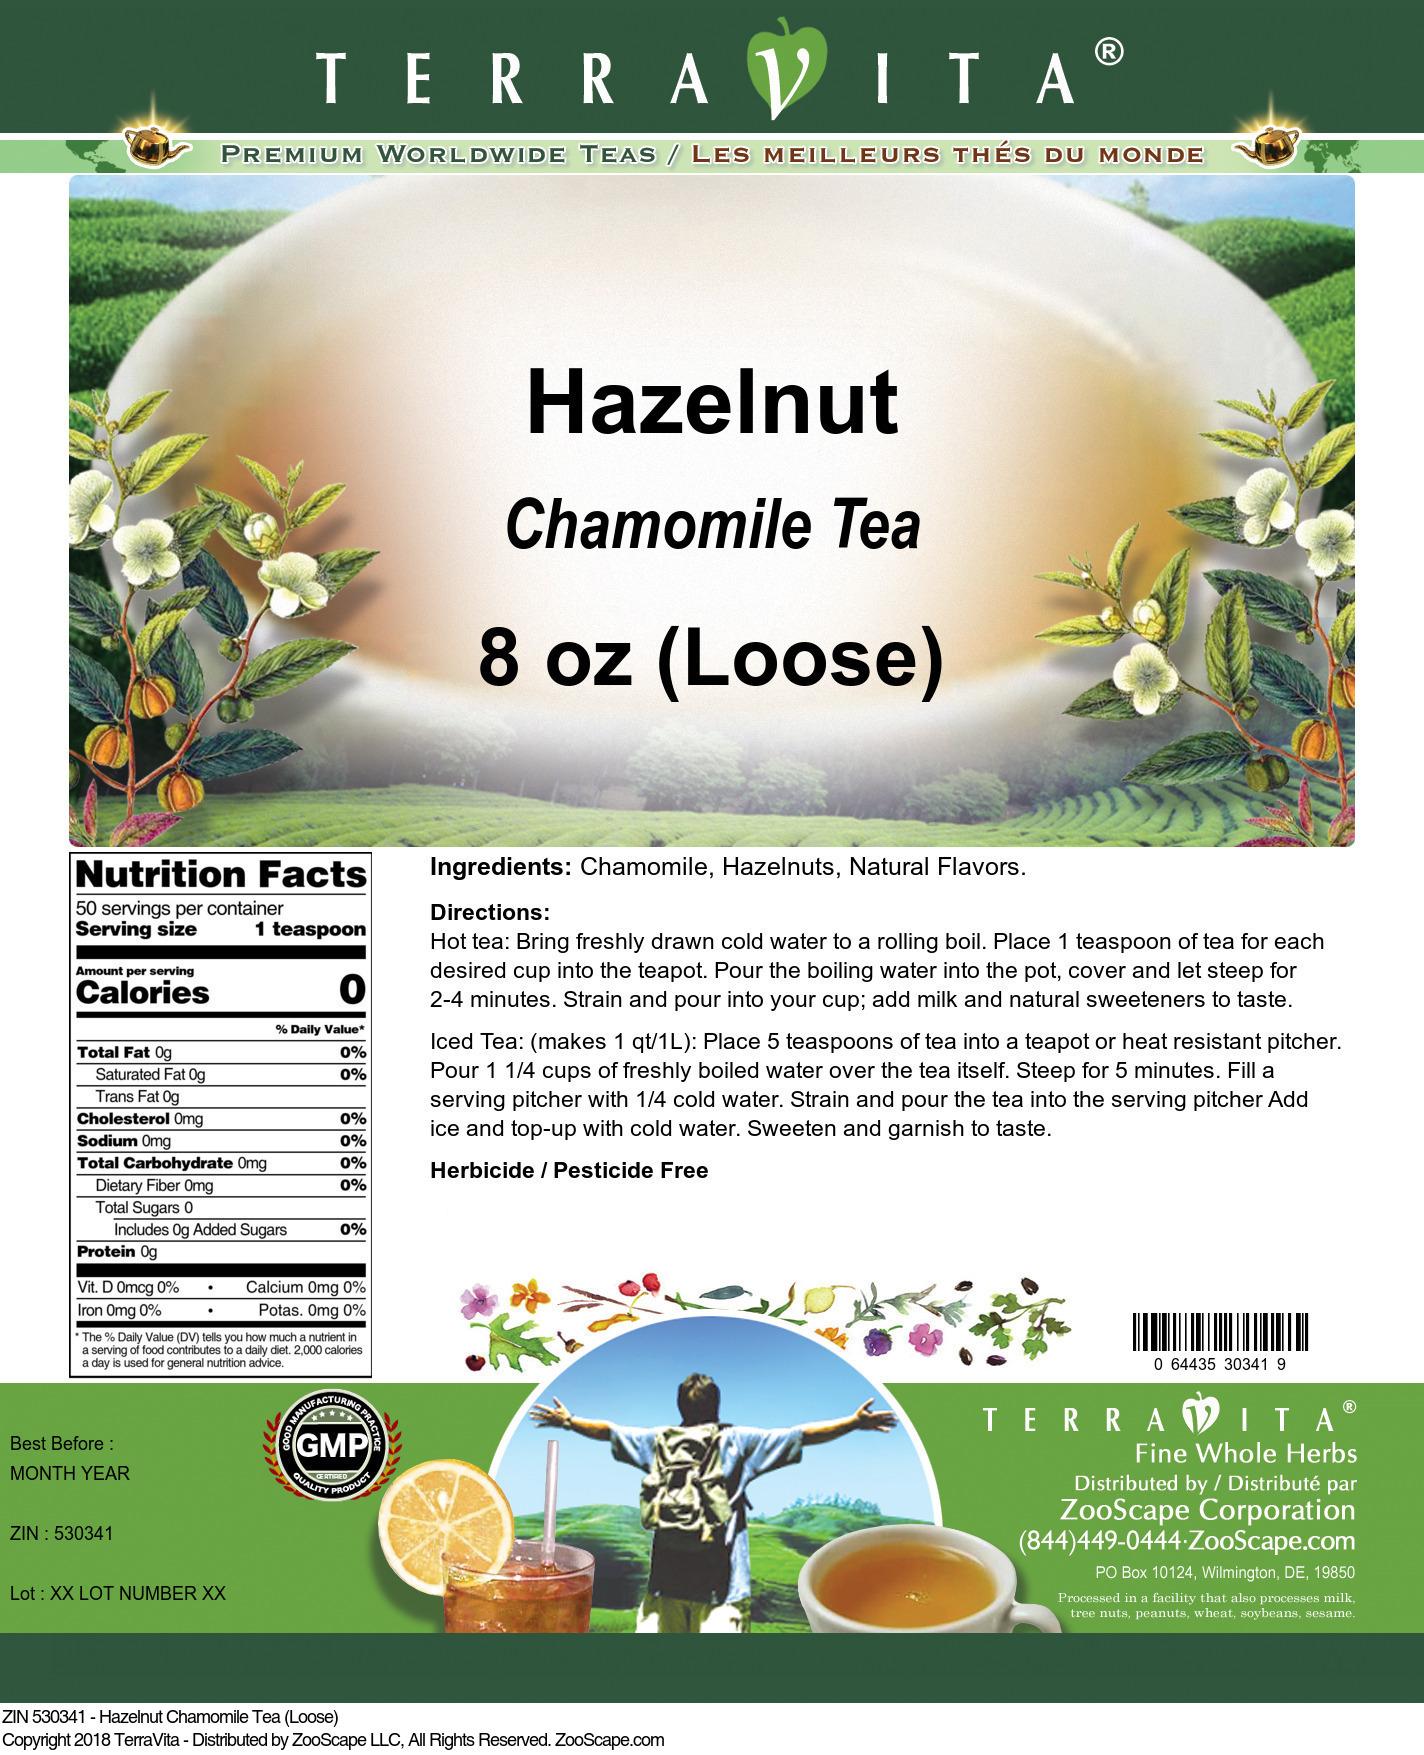 Hazelnut Chamomile Tea